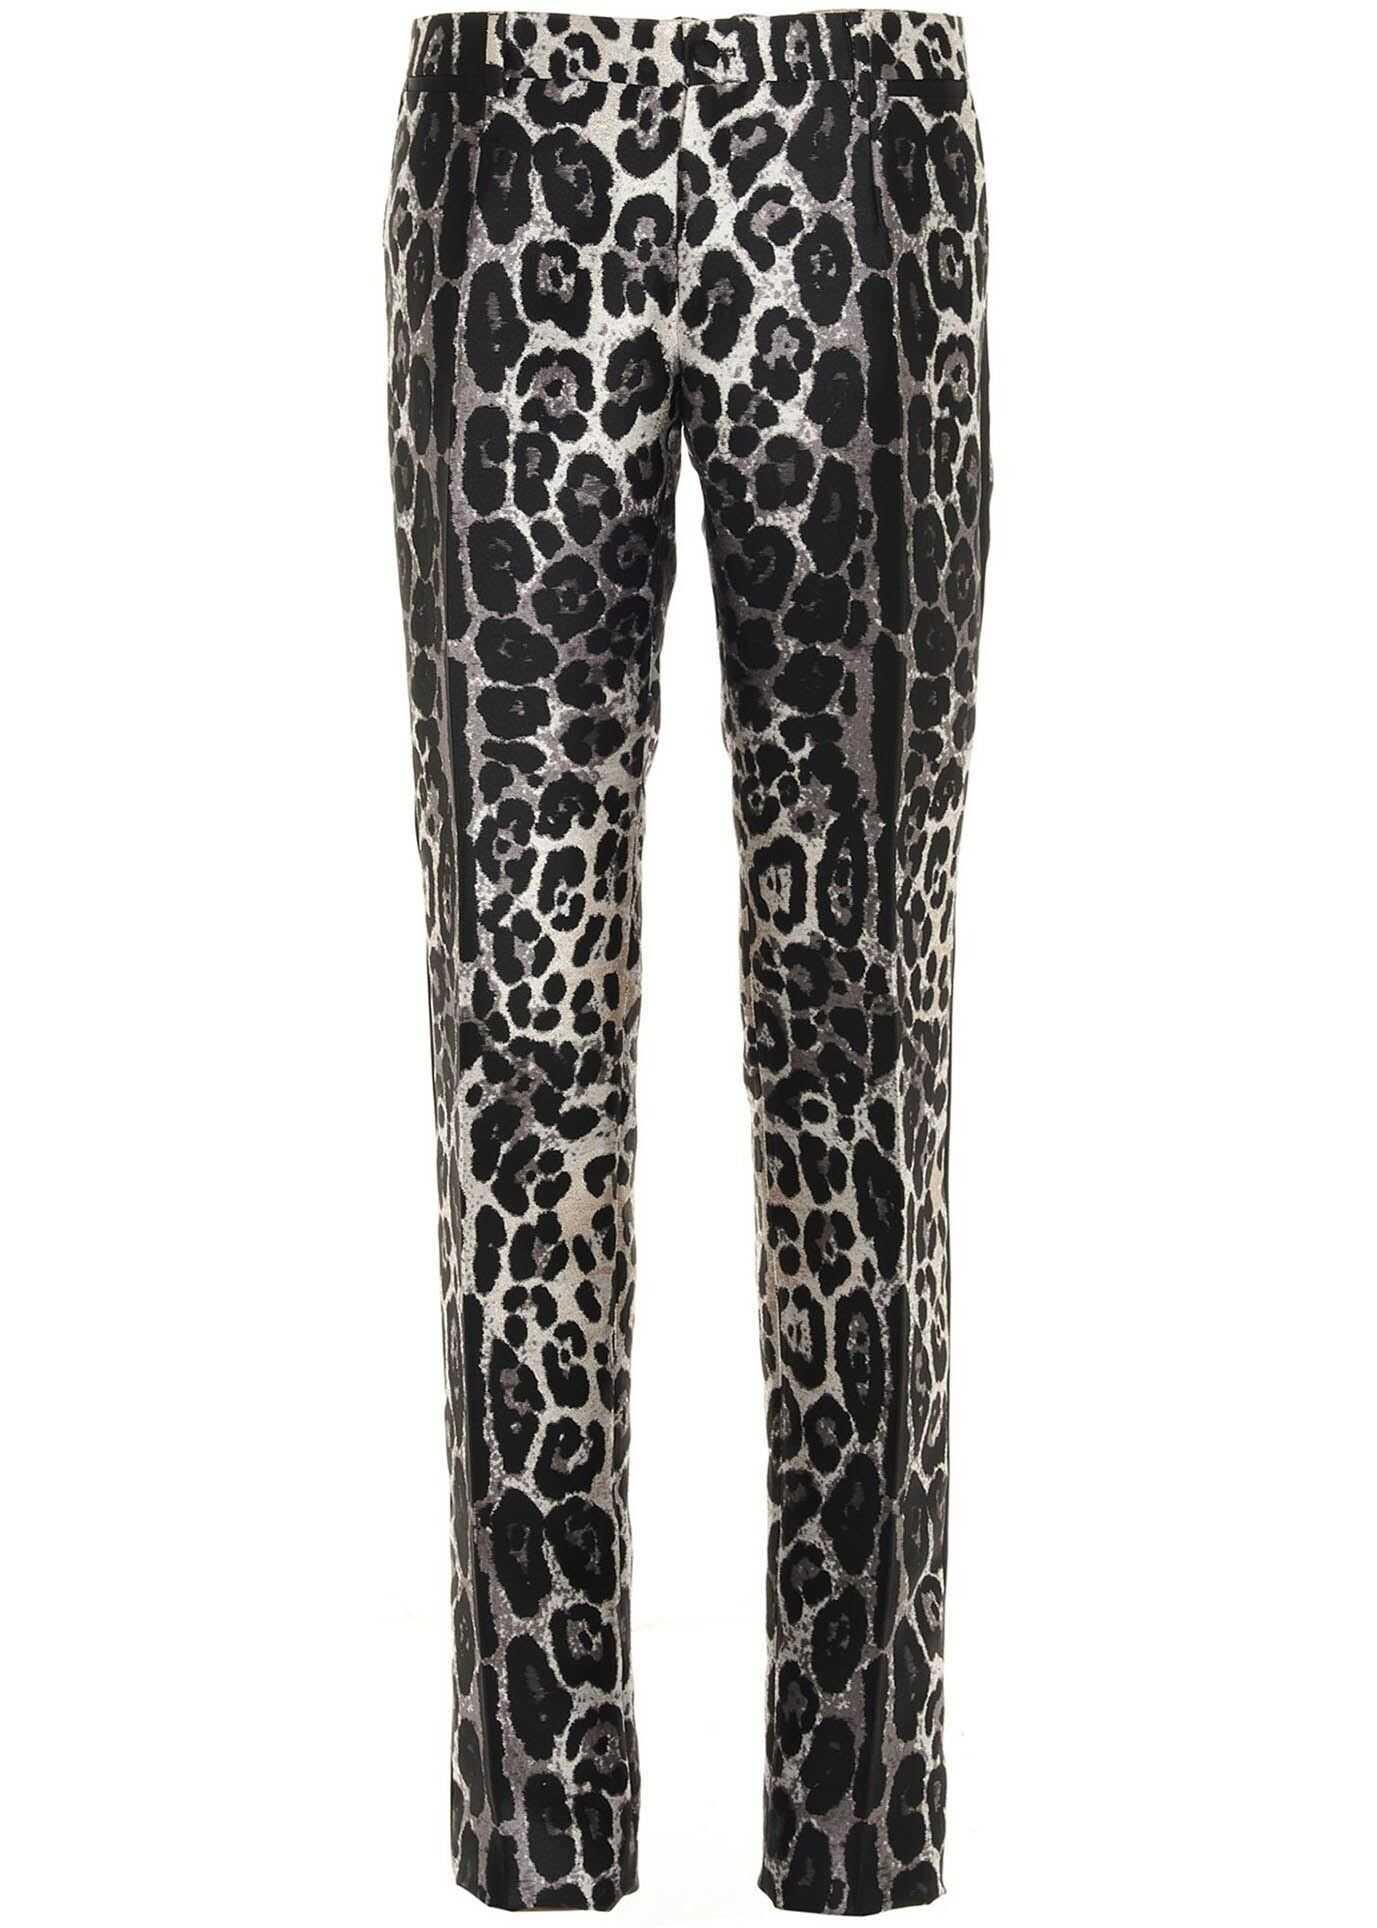 Dolce & Gabbana Leopard Print Tuxedo Pants Animal print imagine